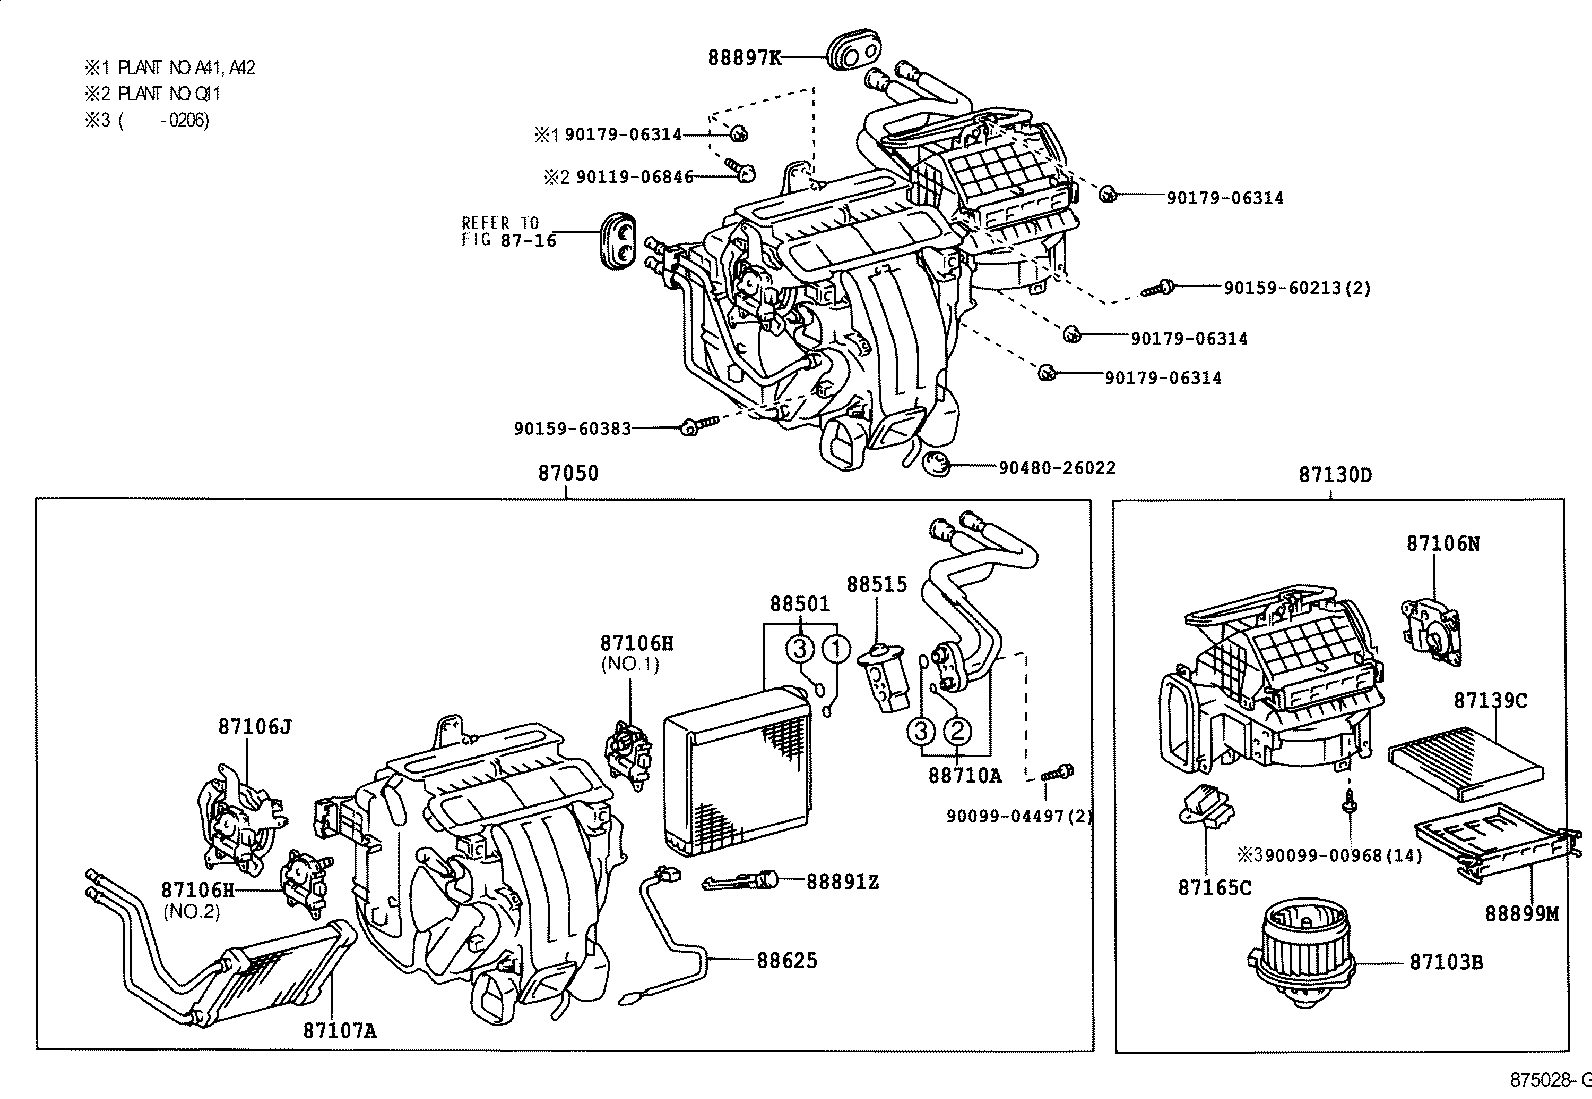 lexus es300 330mcv31l-beagka - electrical